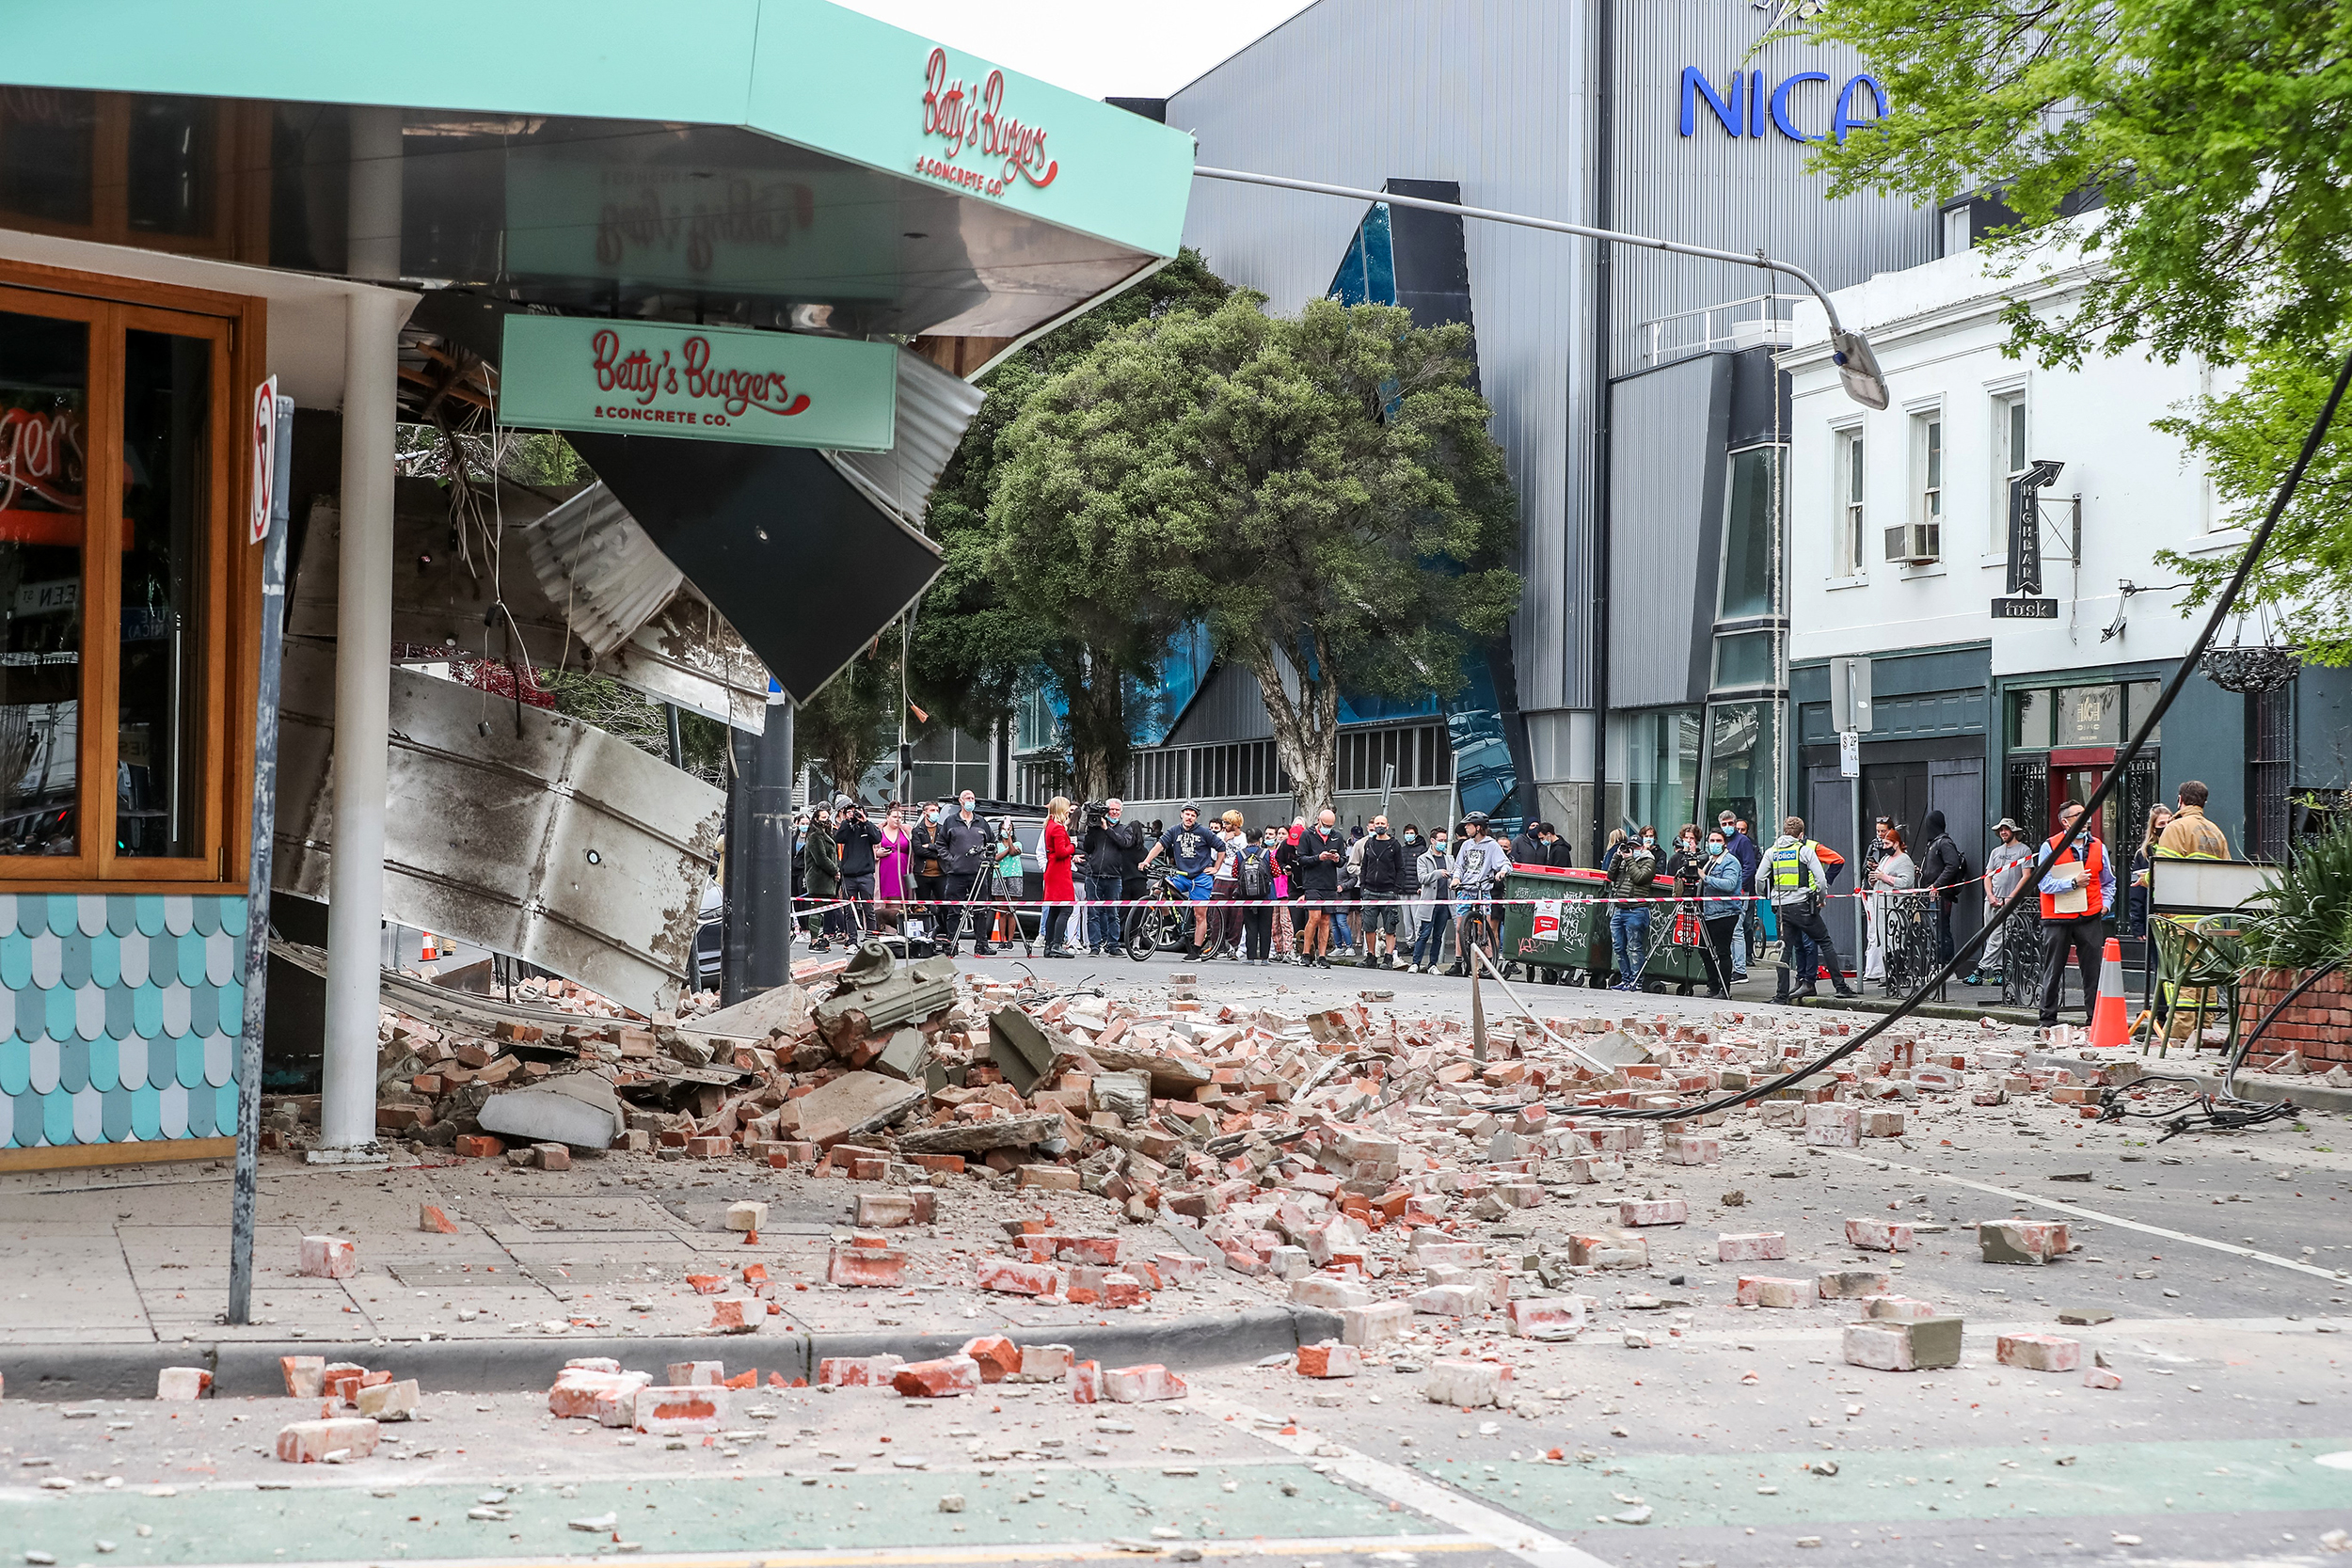 5.8-magnitude earthquake strikes Australia; shaking felt in Melbourne